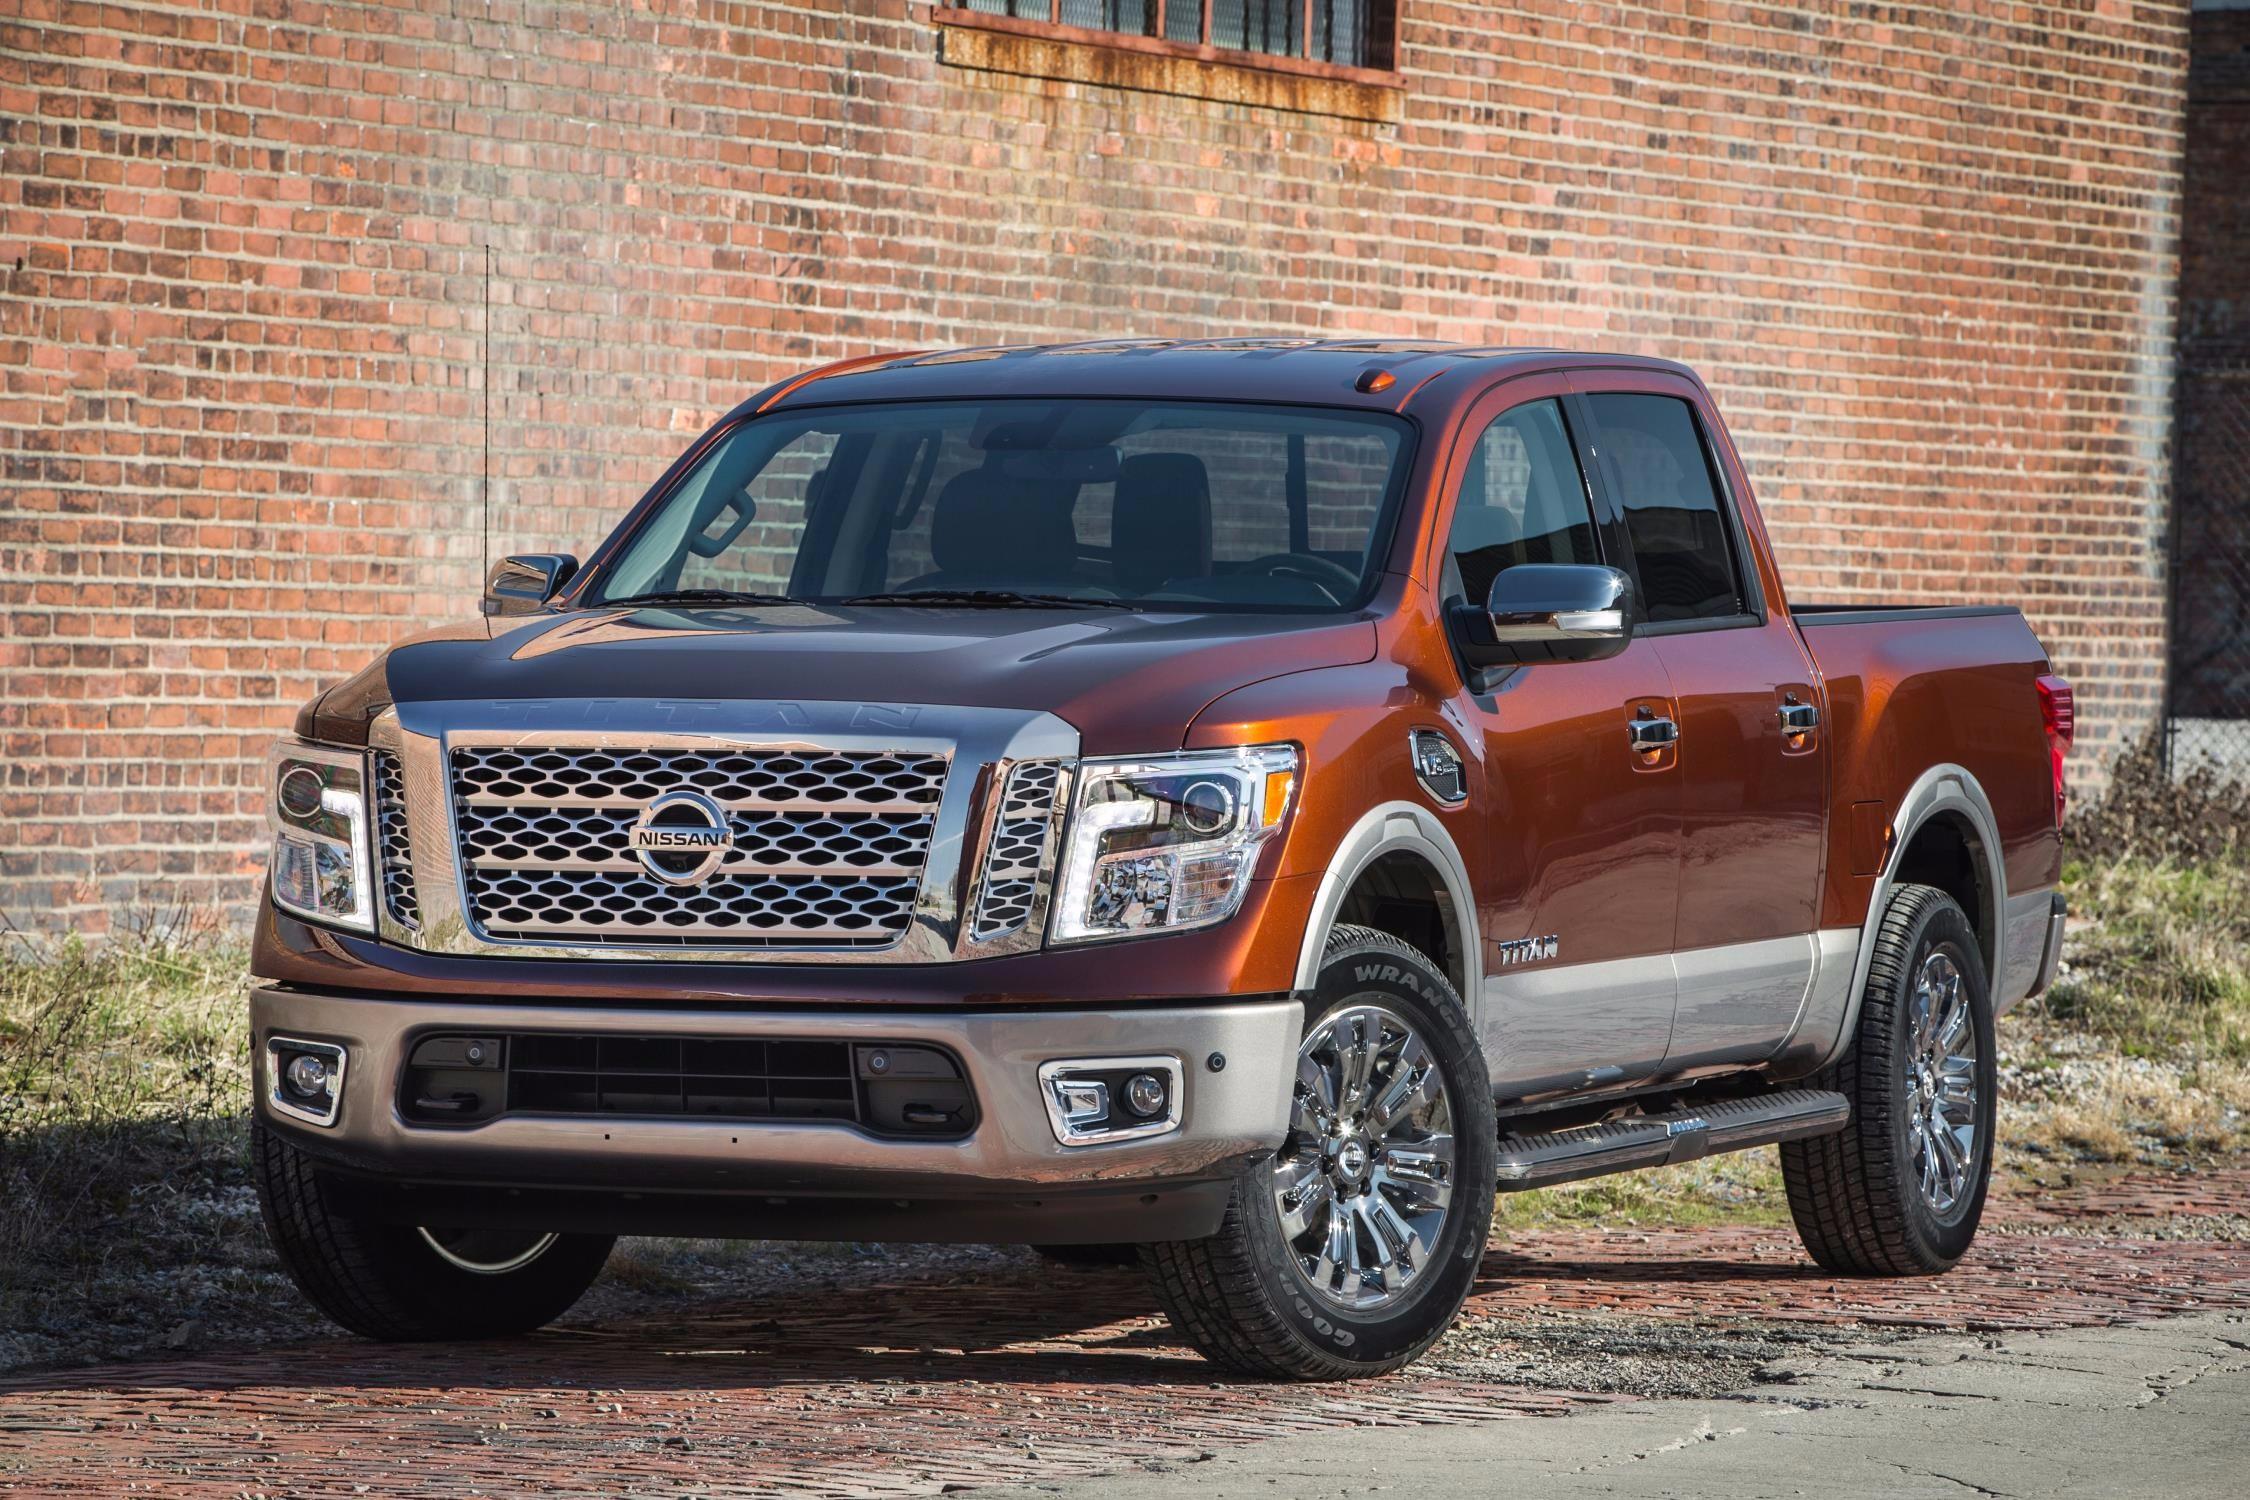 most expensive truck - 2017_nissan_titan_crew_cab